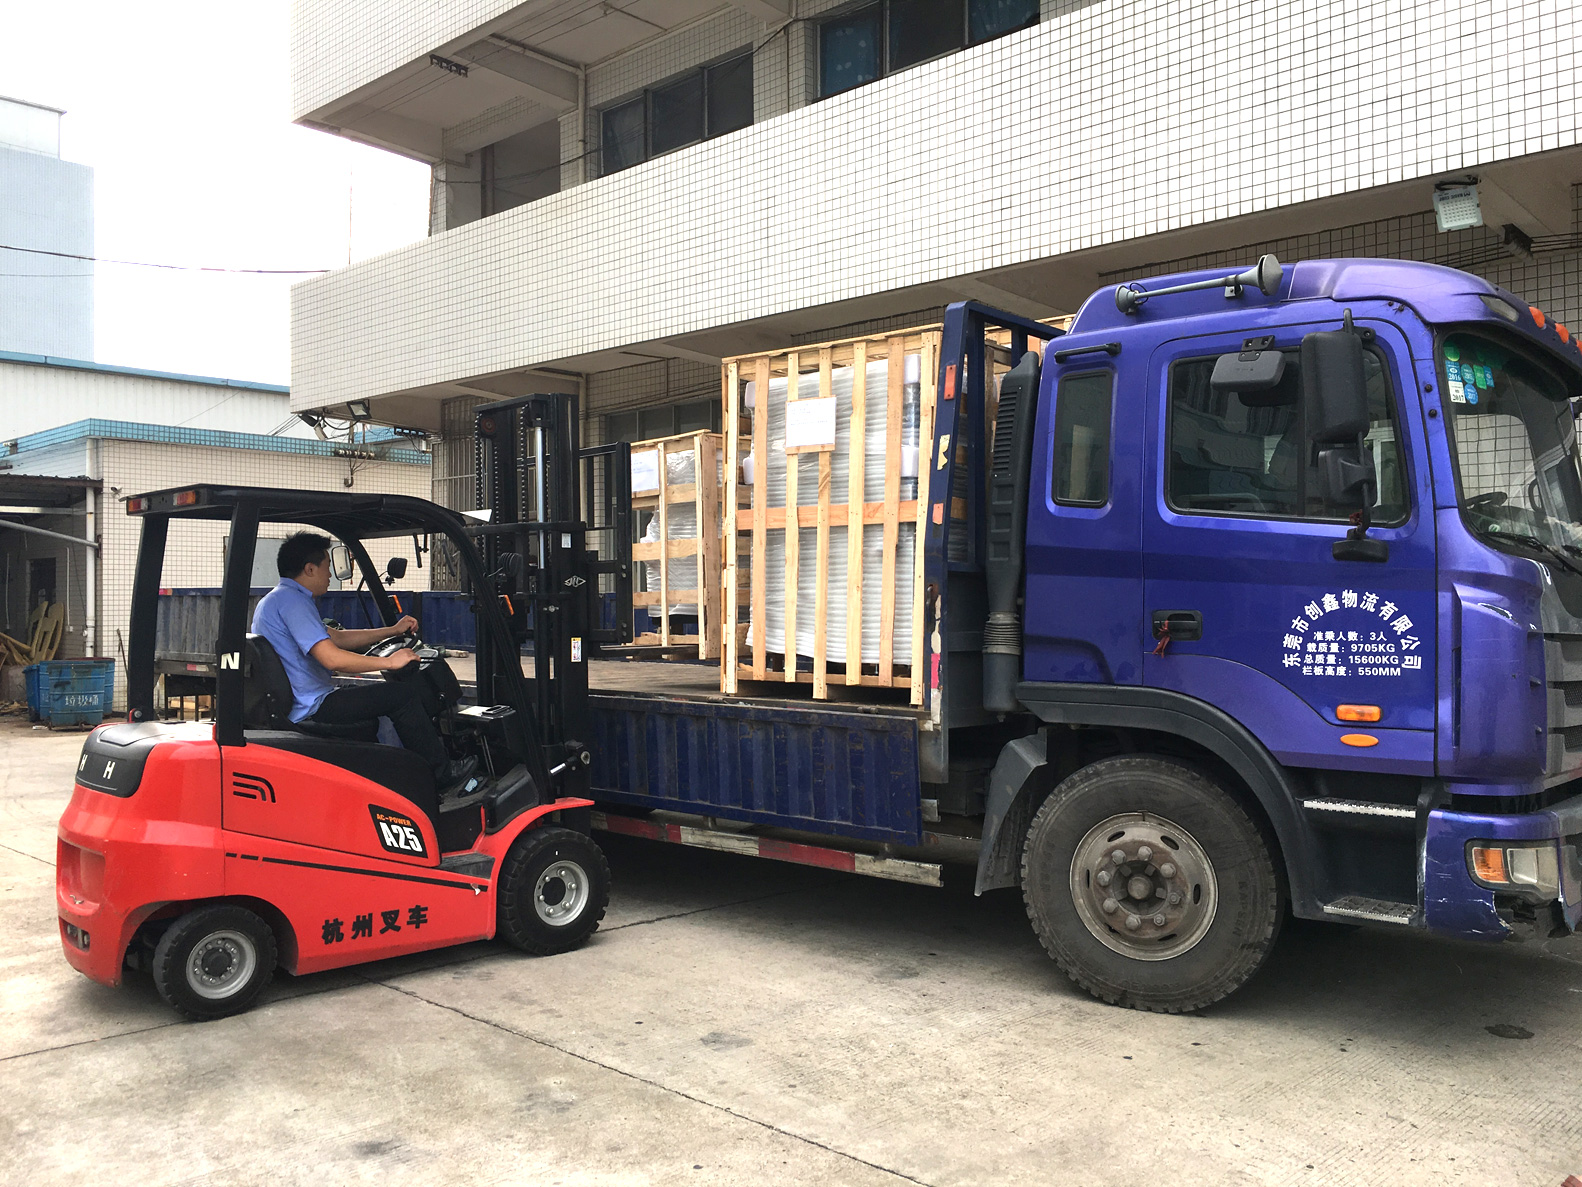 2018-07-30 Shipment | Thermal Shock Chamber